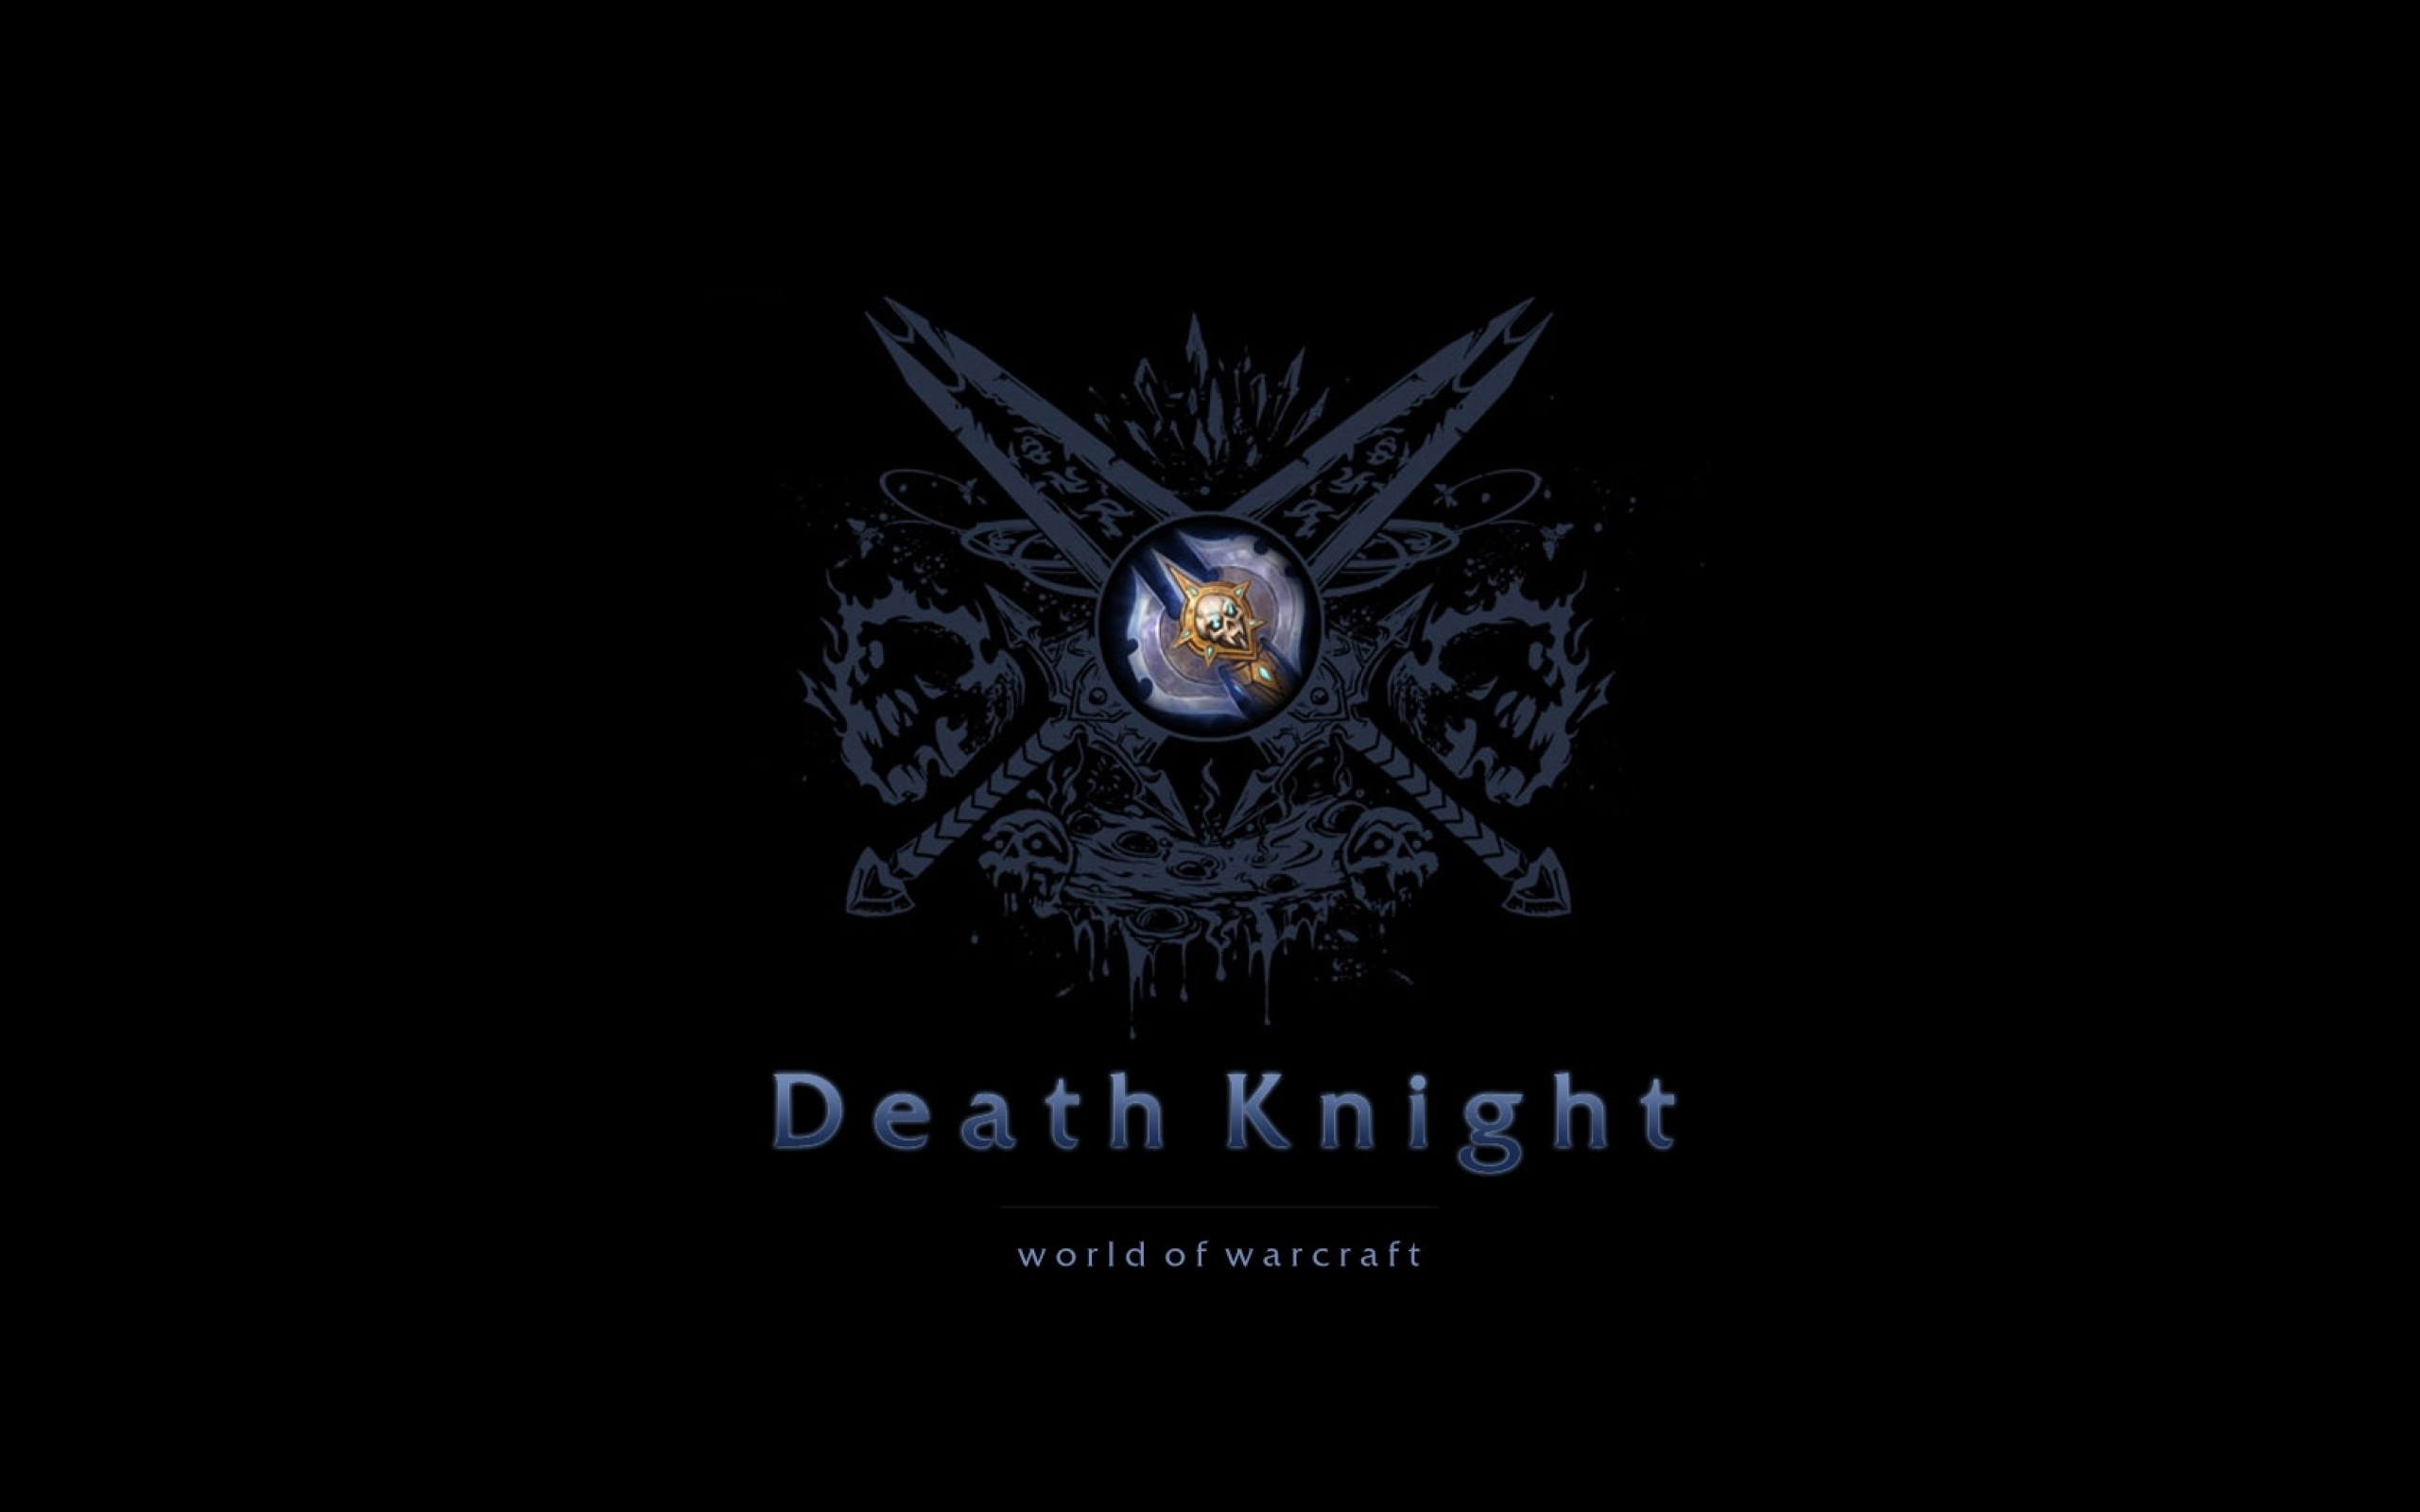 death knight wow themed wallpaper thread more like this please8230  1680×1050 wallpaper Art HD Wallpaper